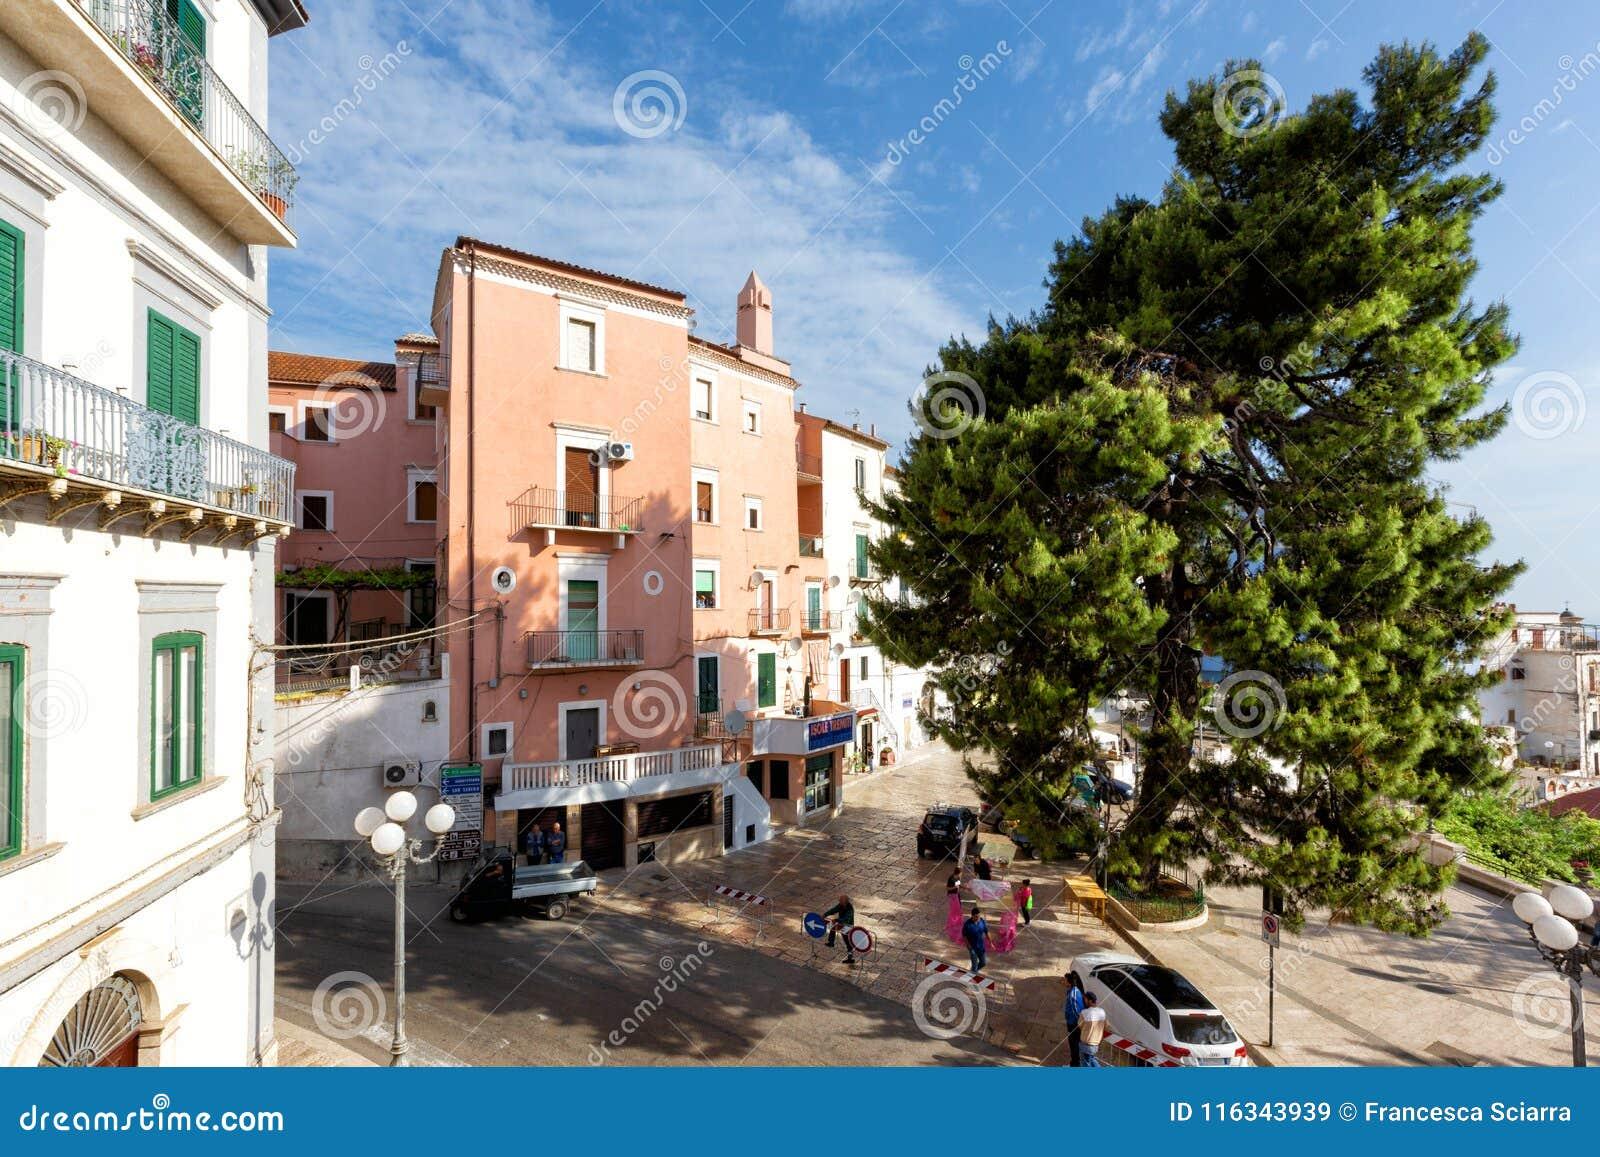 Vila de RODI GARGANICO em Puglia